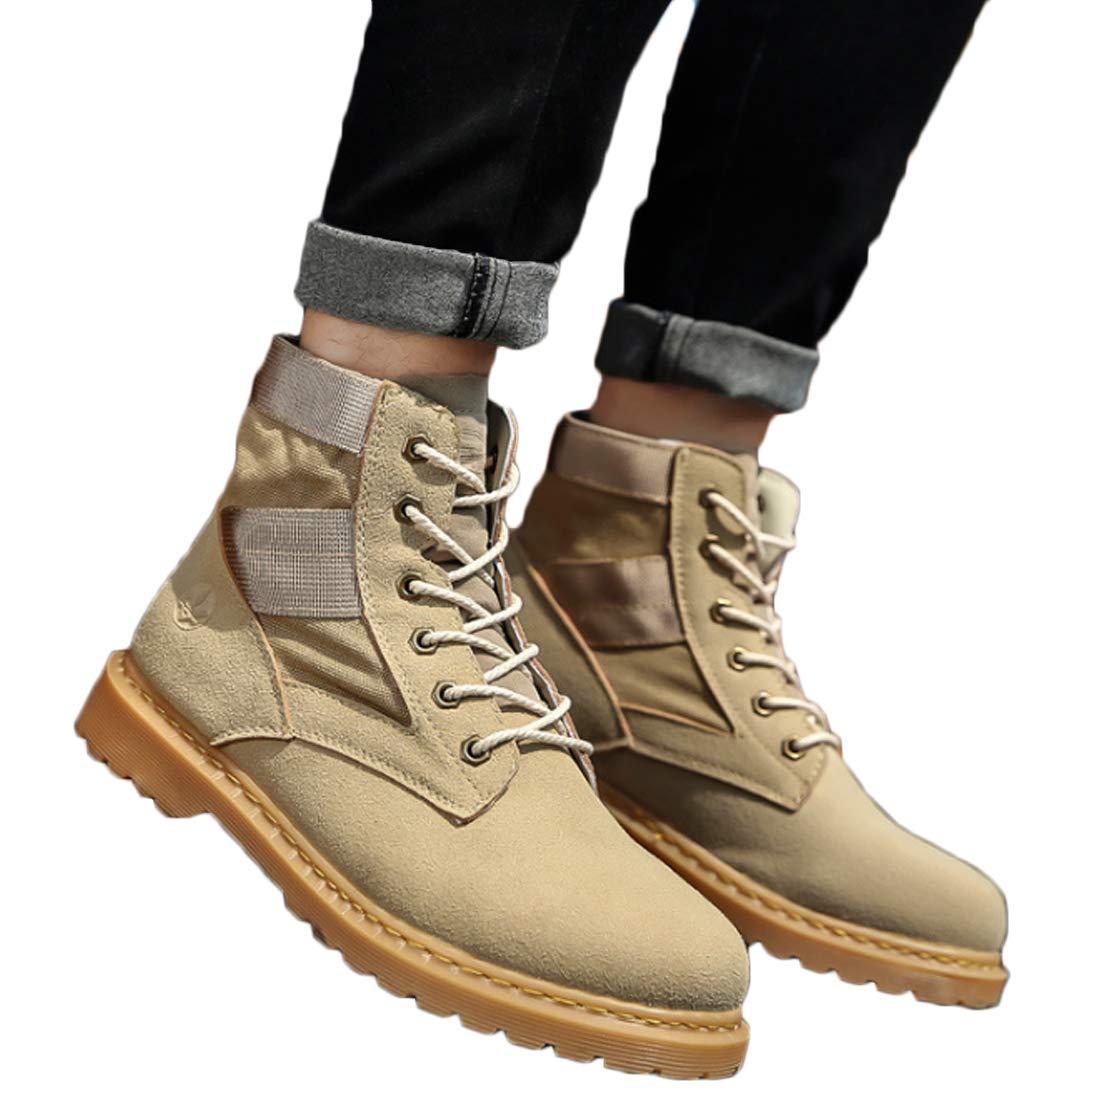 Aiweijia Sneakers da Uomo con Cuciture da Uomo Scarpe Casual